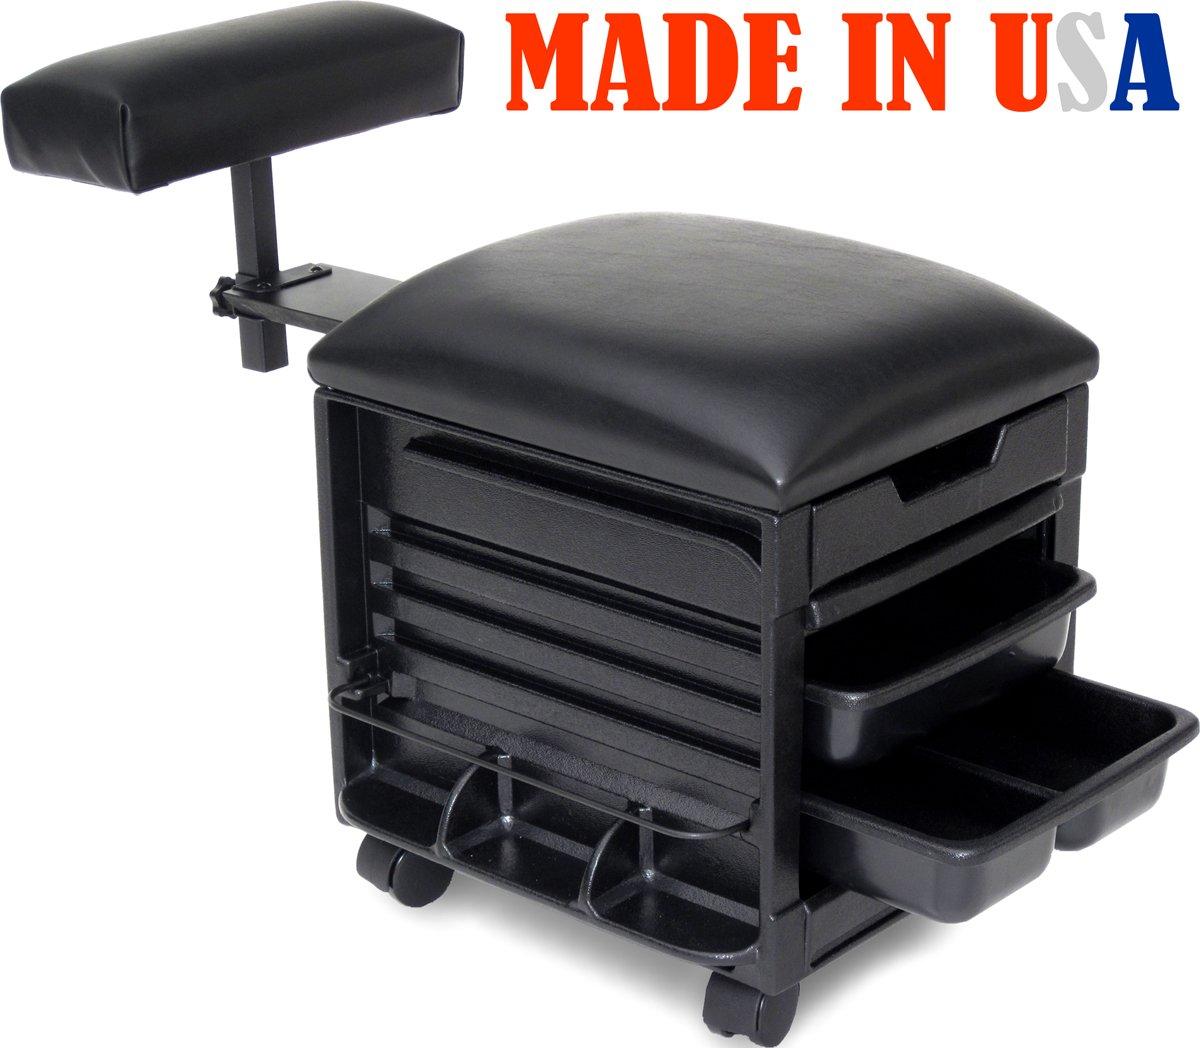 Dina Meri 2316-HF Salon Spa Pedicure Nail Stool, Seat w/Adjustable footrest Made in USA